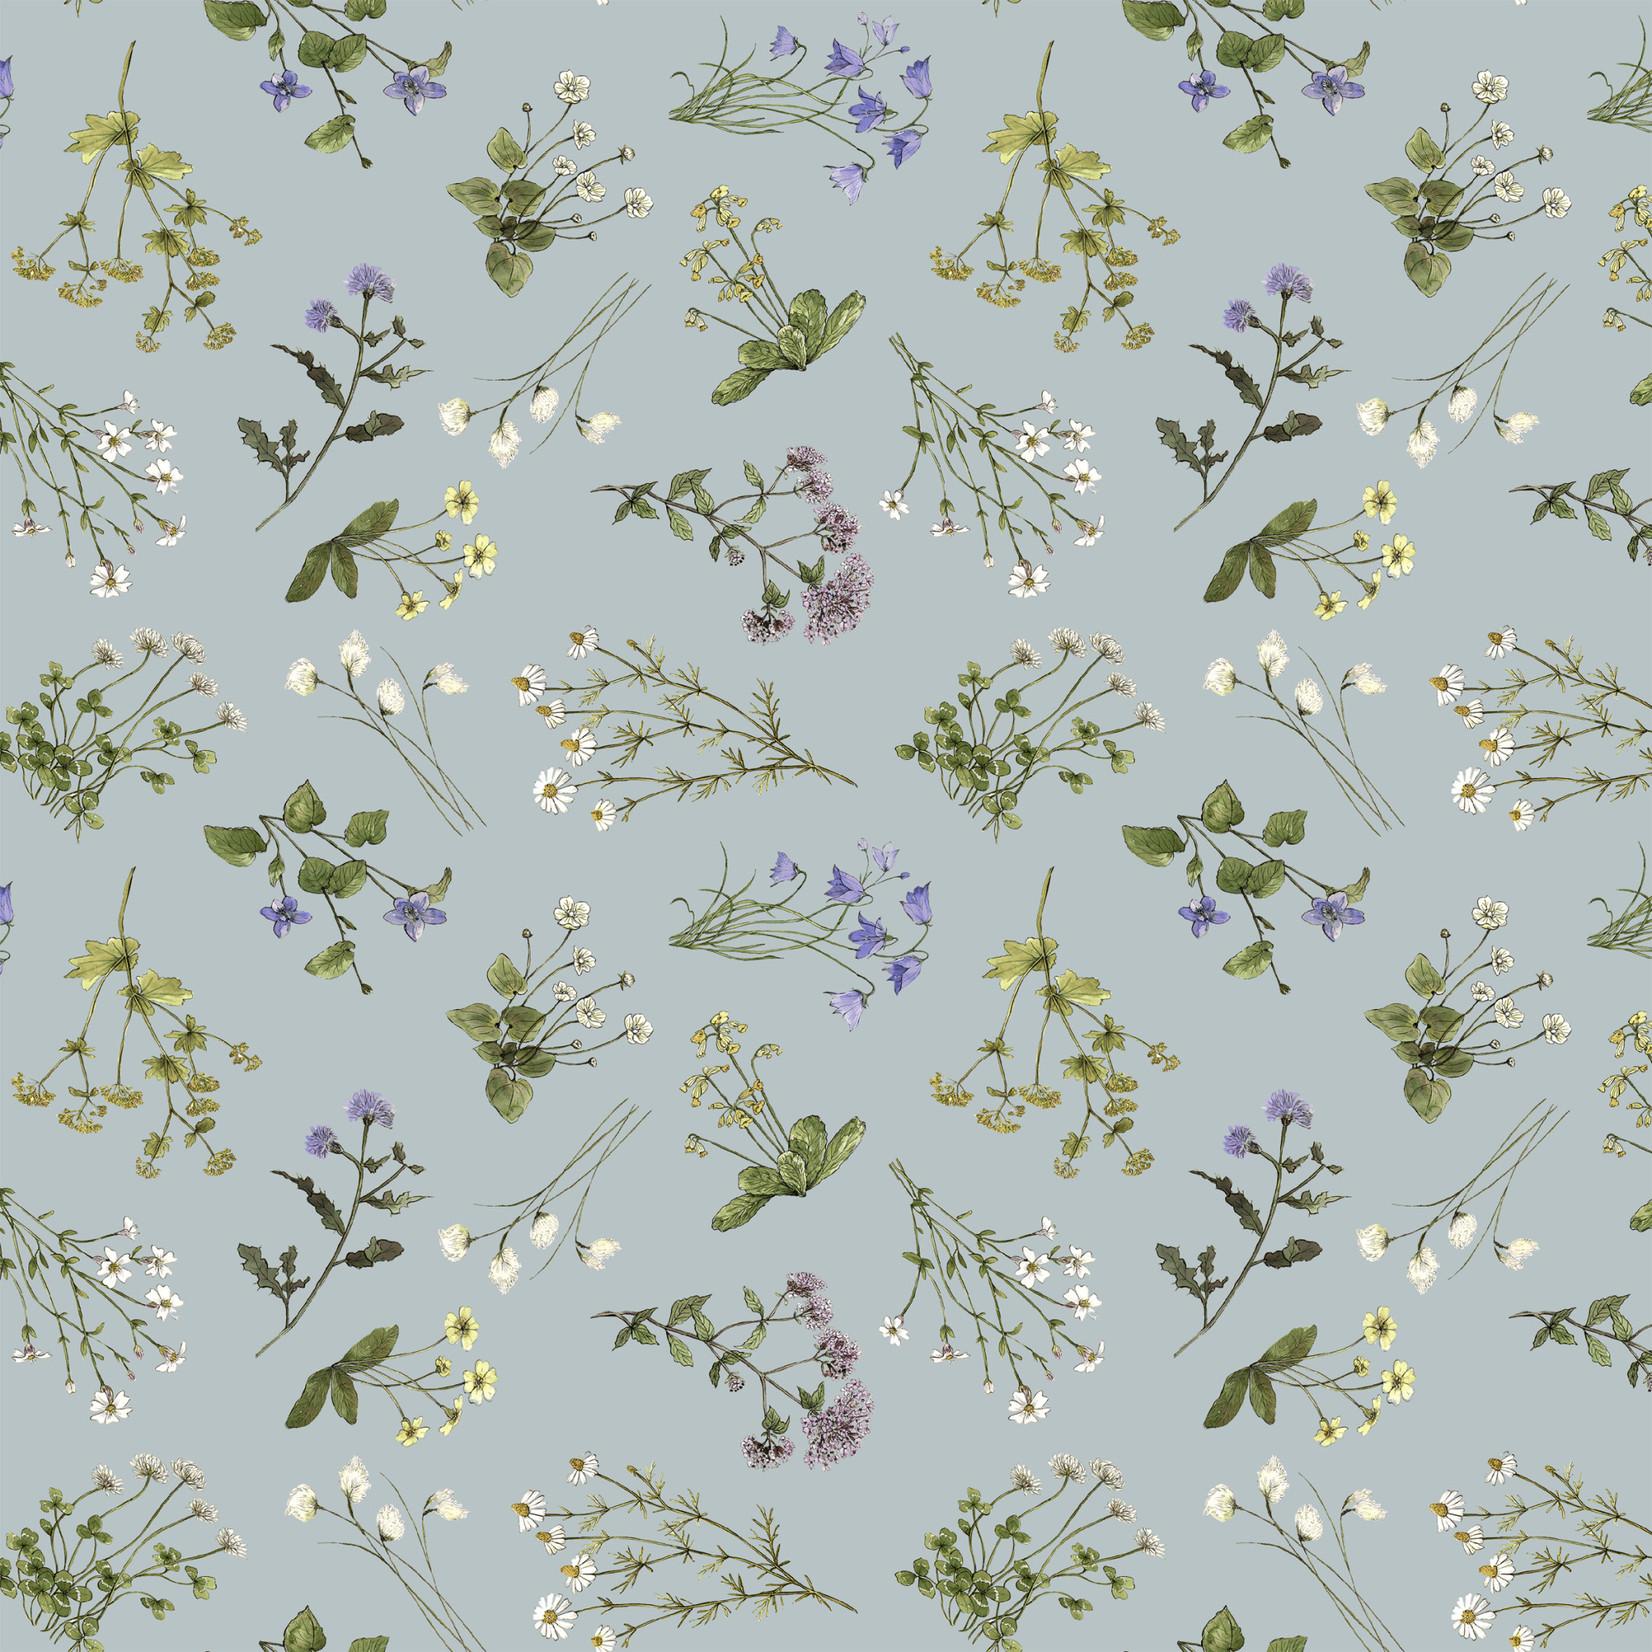 Windham Fabrics Midsummer - Meadow Ditsy - Sky